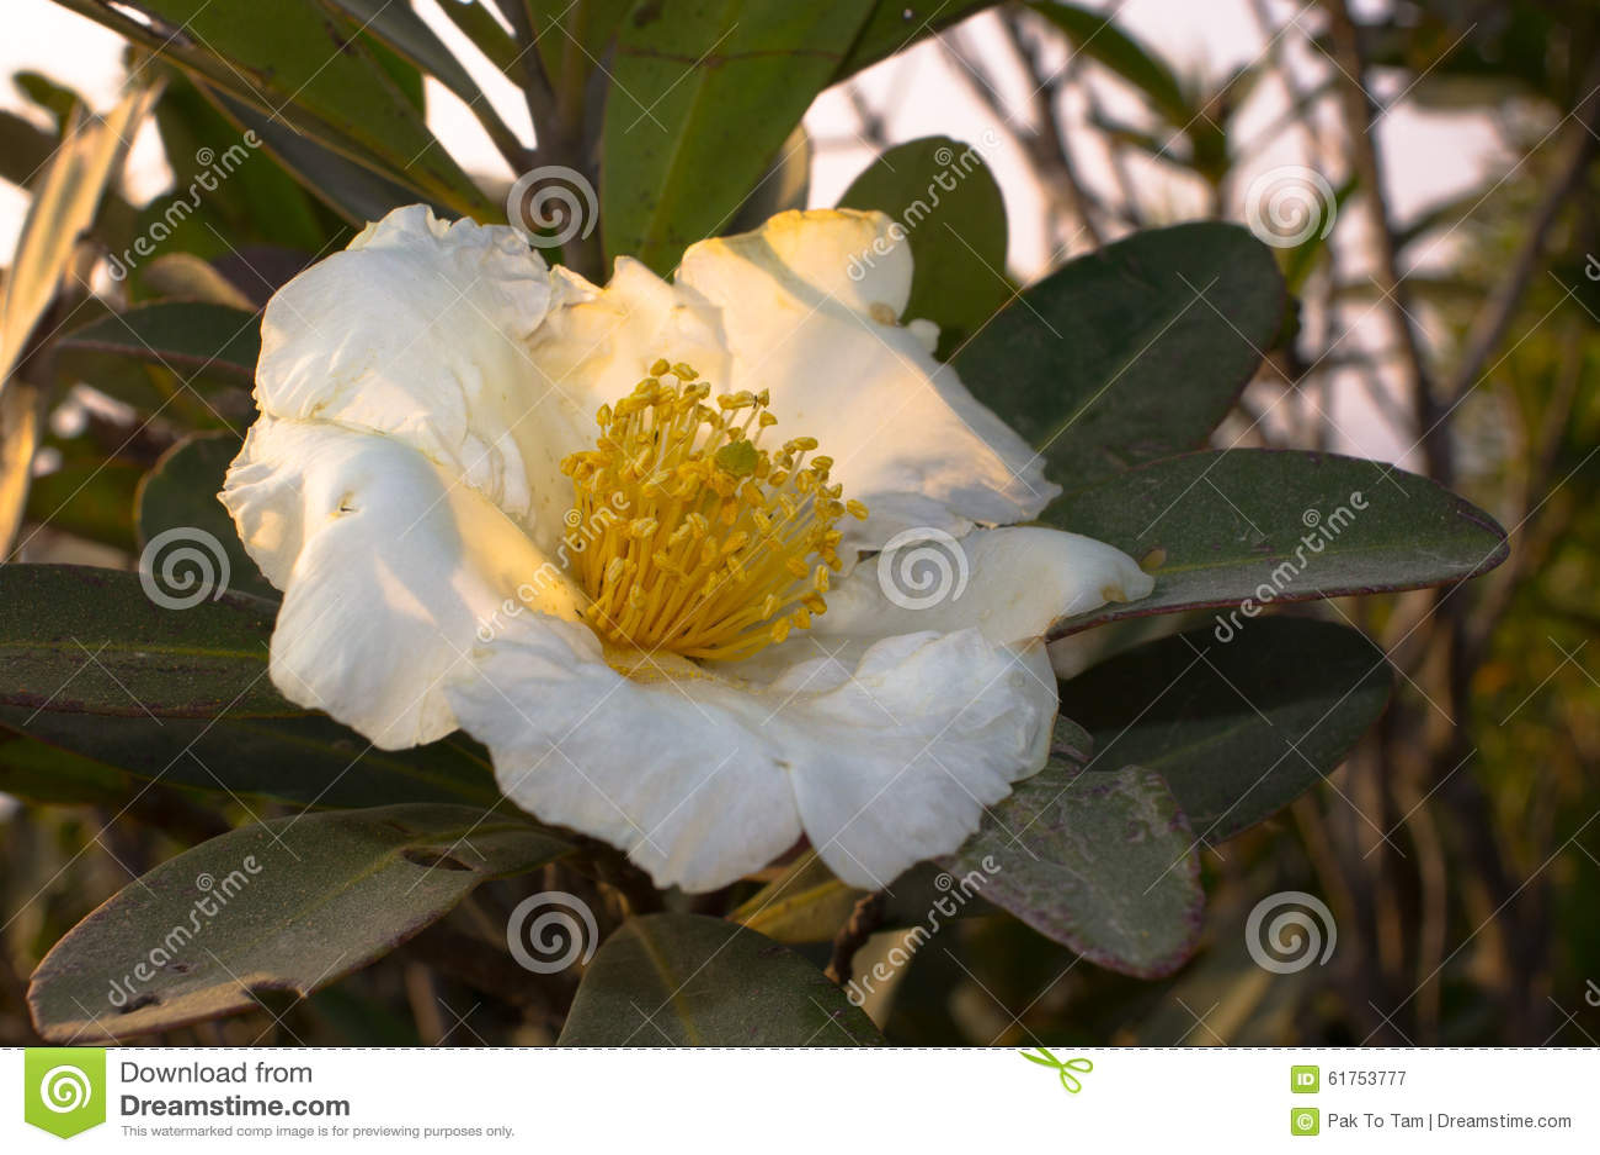 White flower with yellow stamen in backlight stock image image of download white flower with yellow stamen in backlight stock image image of nature spring mightylinksfo